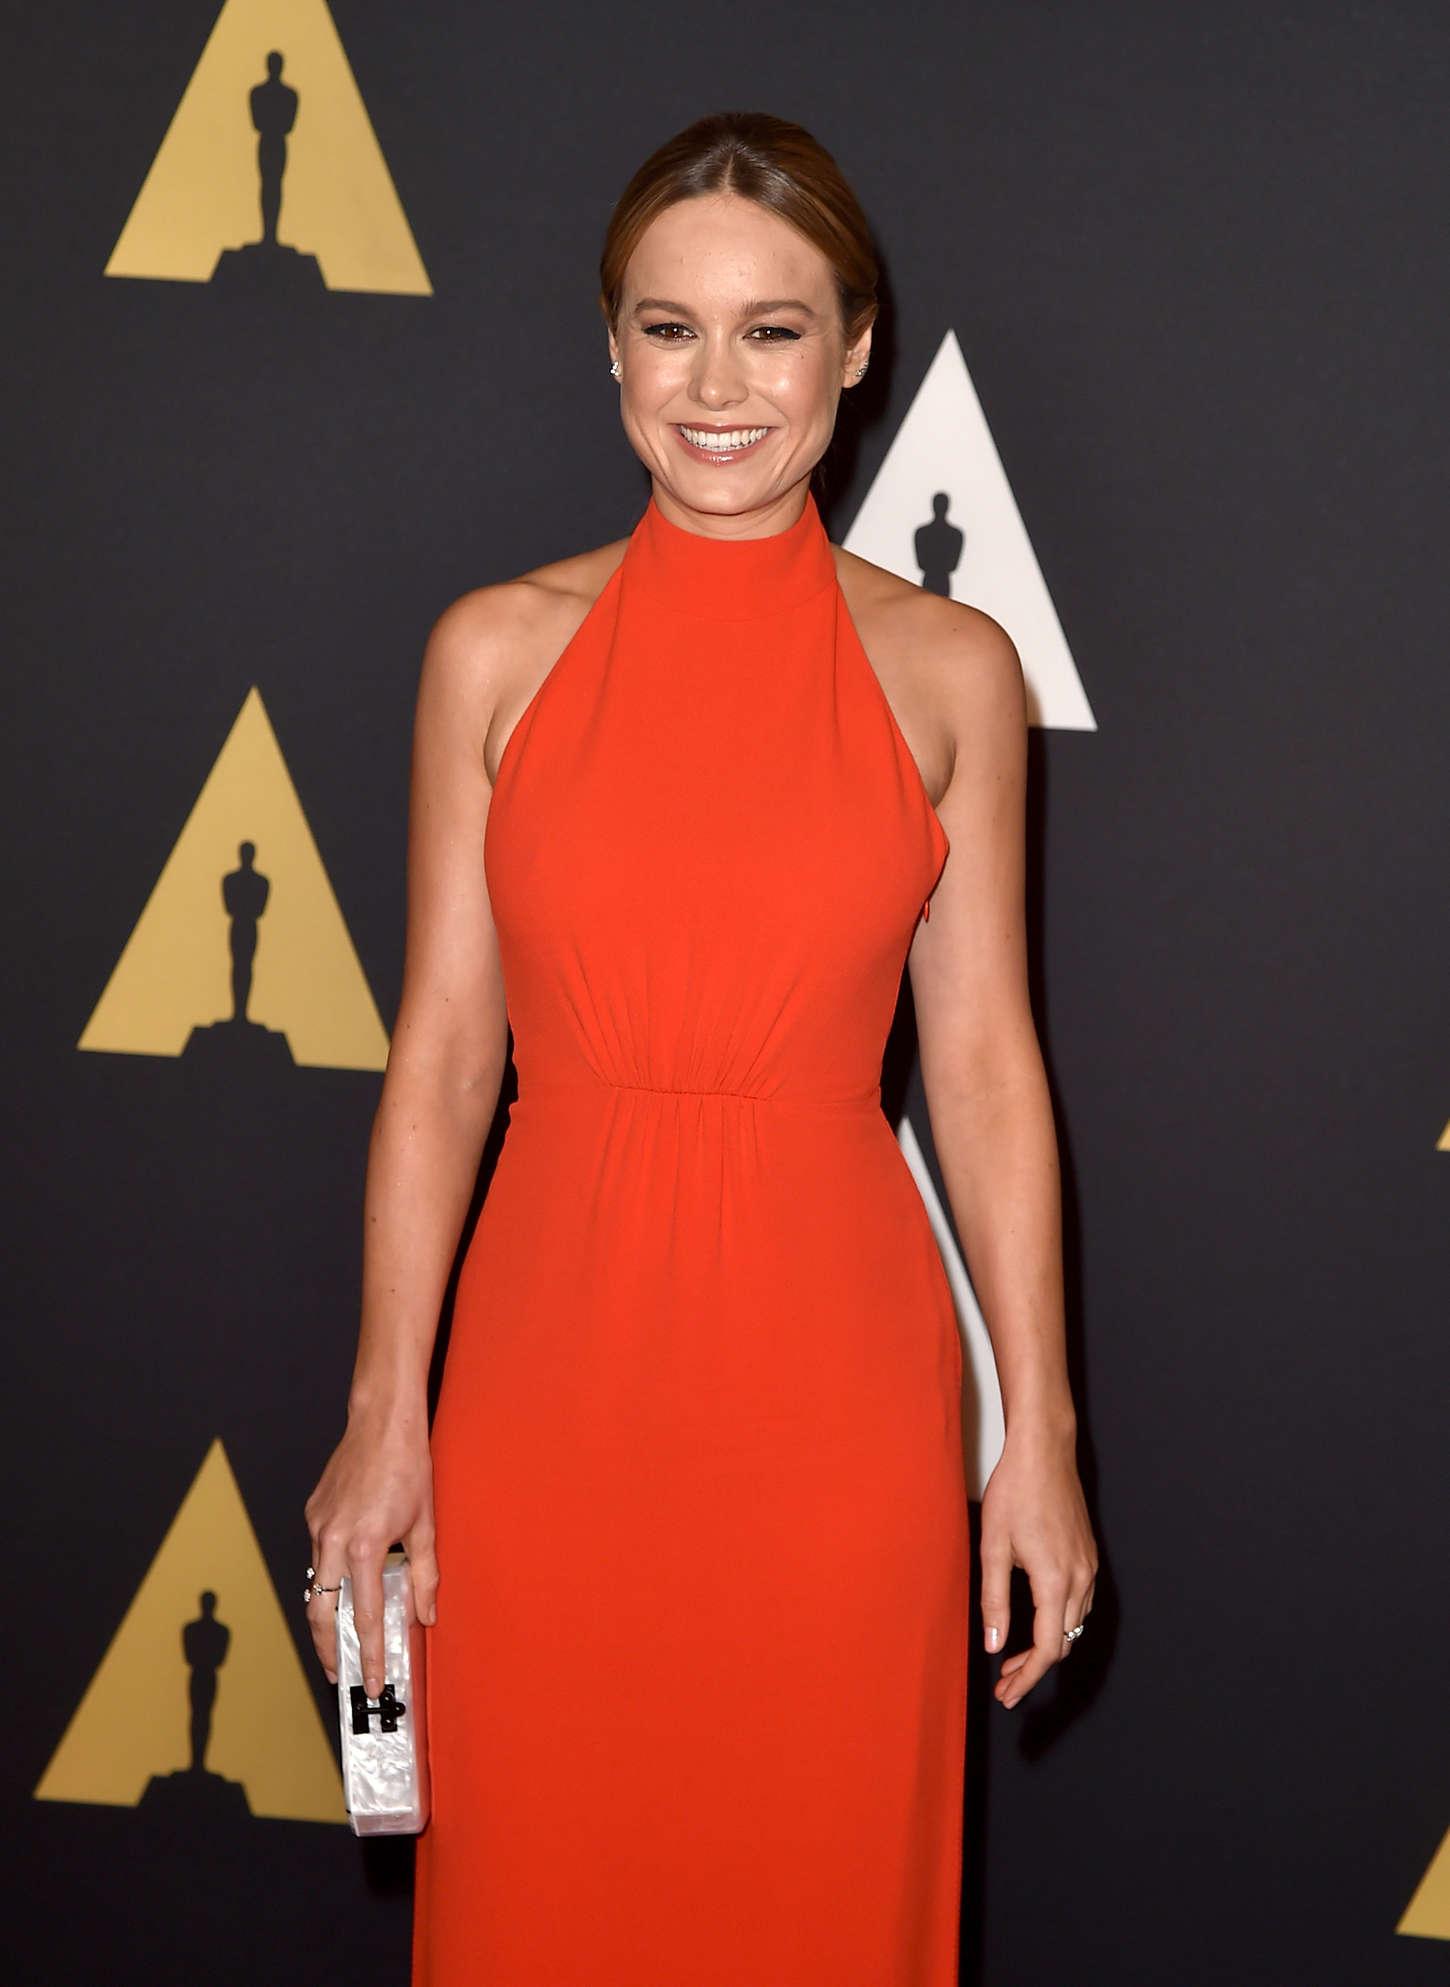 Brie Larson 2015 : Brie Larson: Governors Awards 2015 -04